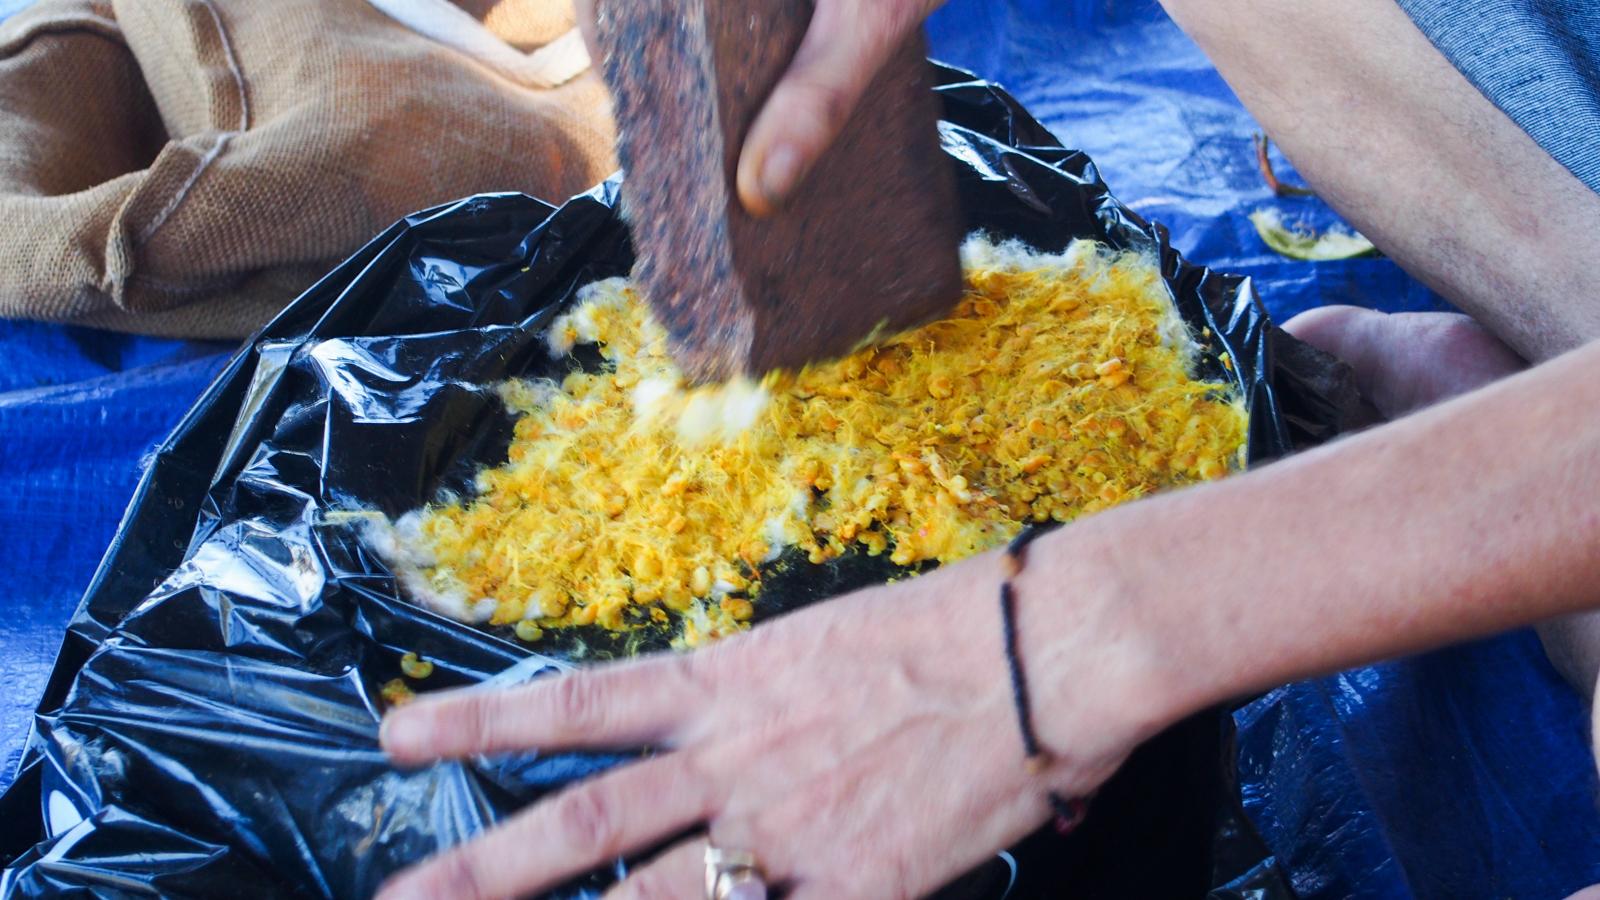 Crushing kapok seeds turns the white fibre inside bright yellow.